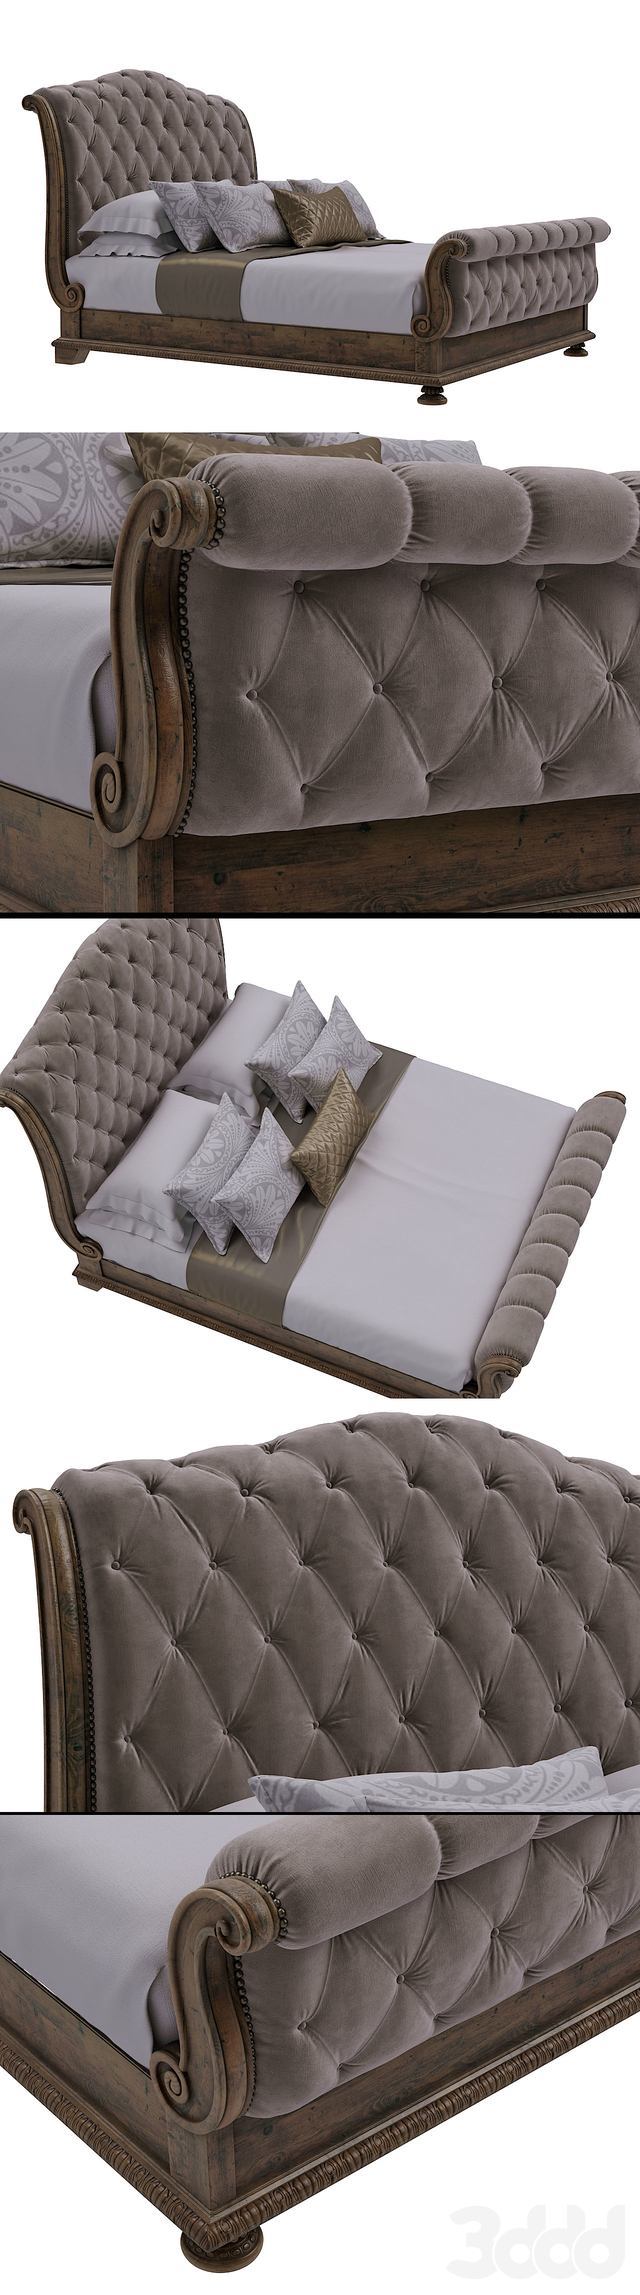 Hooker Furniture Bedroom Rhapsody King Tufted Bed